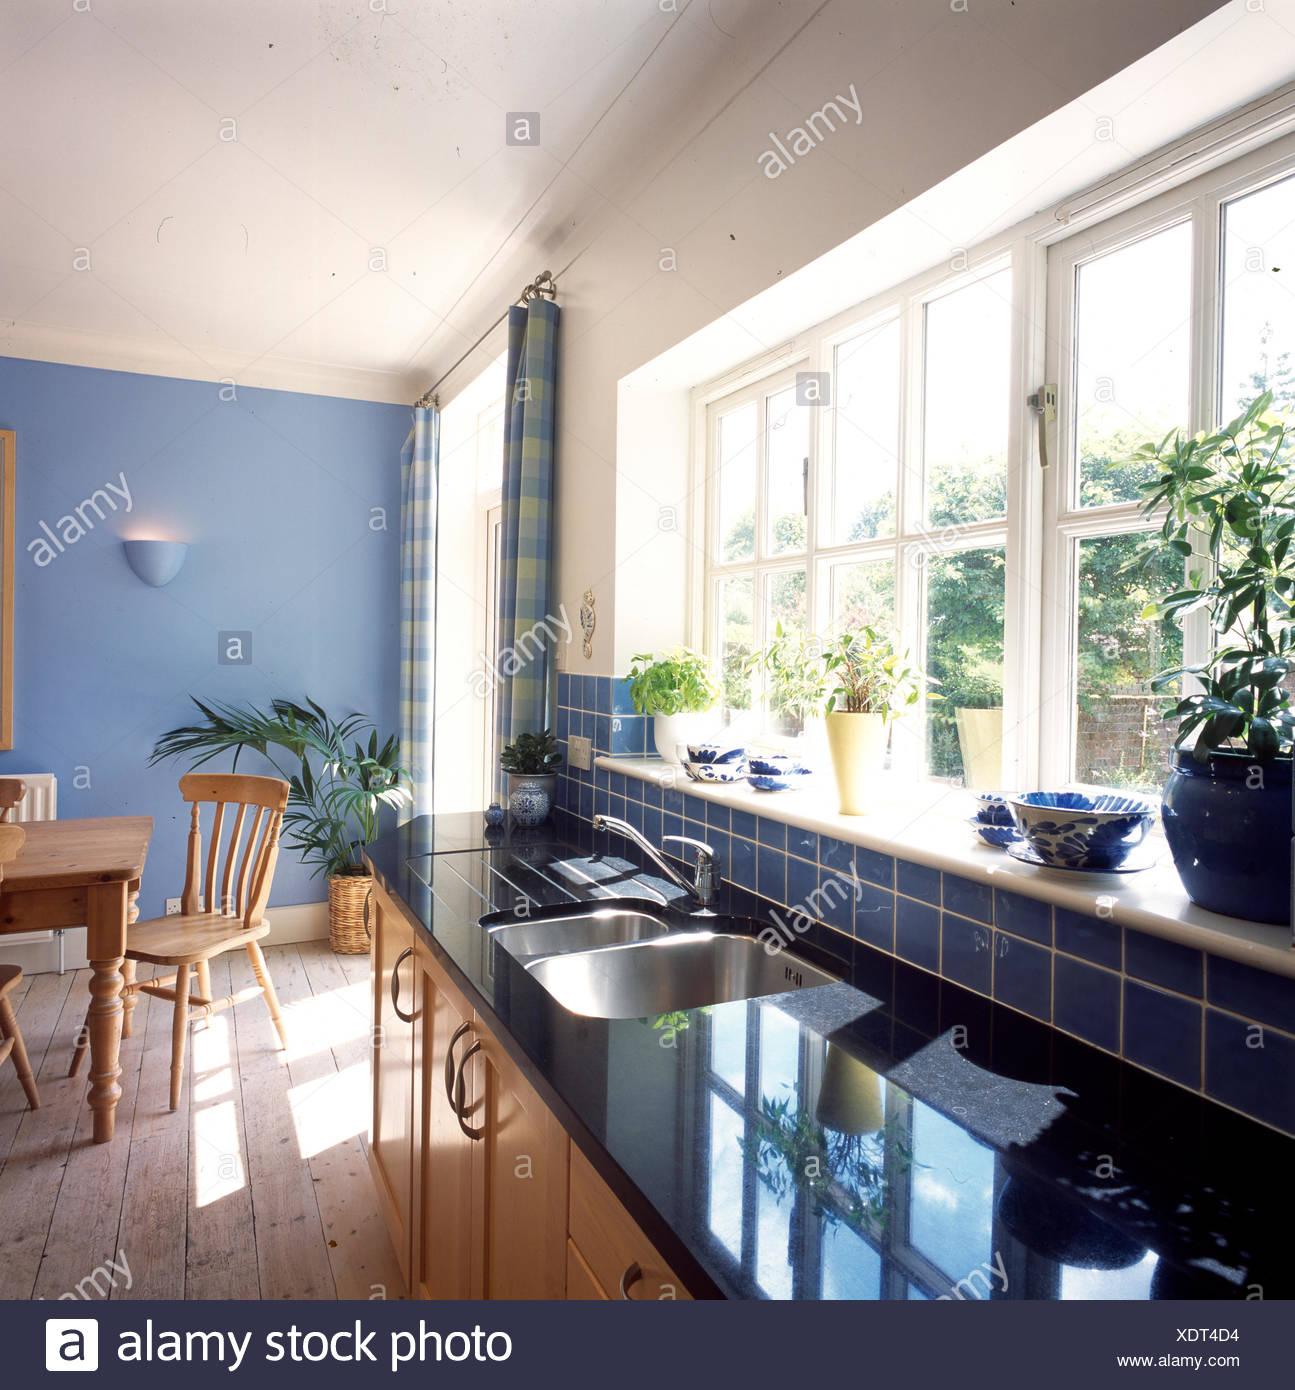 Schwarzer Marmor Arbeitsplatte In Pantry Kuche Stockfoto Bild